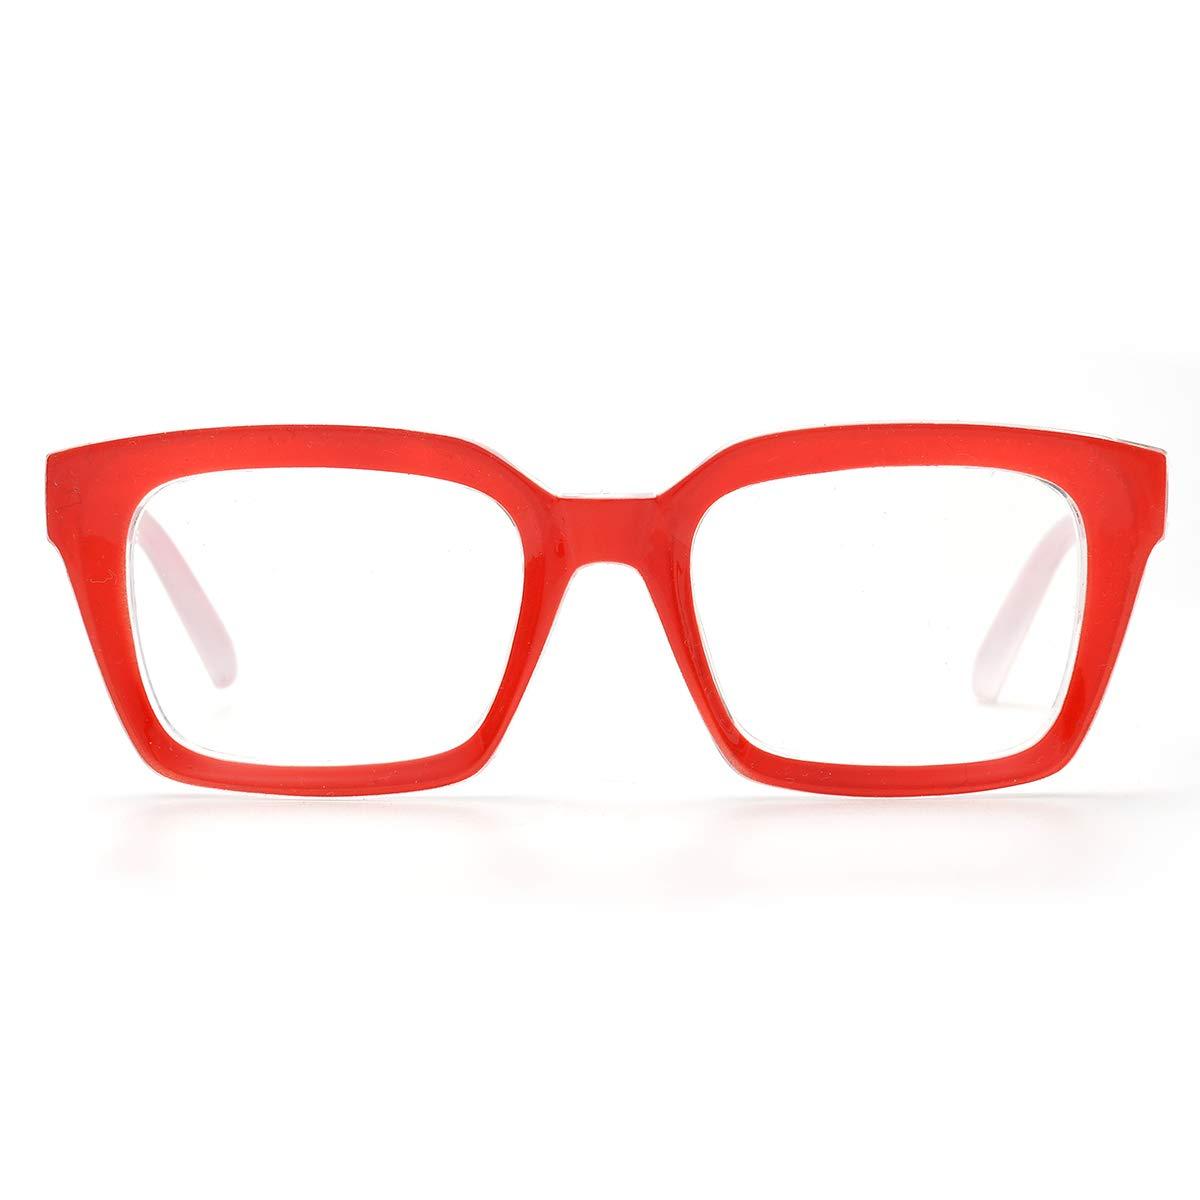 20e64274c669 Amazon.com  Fashion Oprah Style for Women Nerd Eyeglasses Square Big Frames  Large Clear Lens-can replace the prescription lens (Black)  Clothing